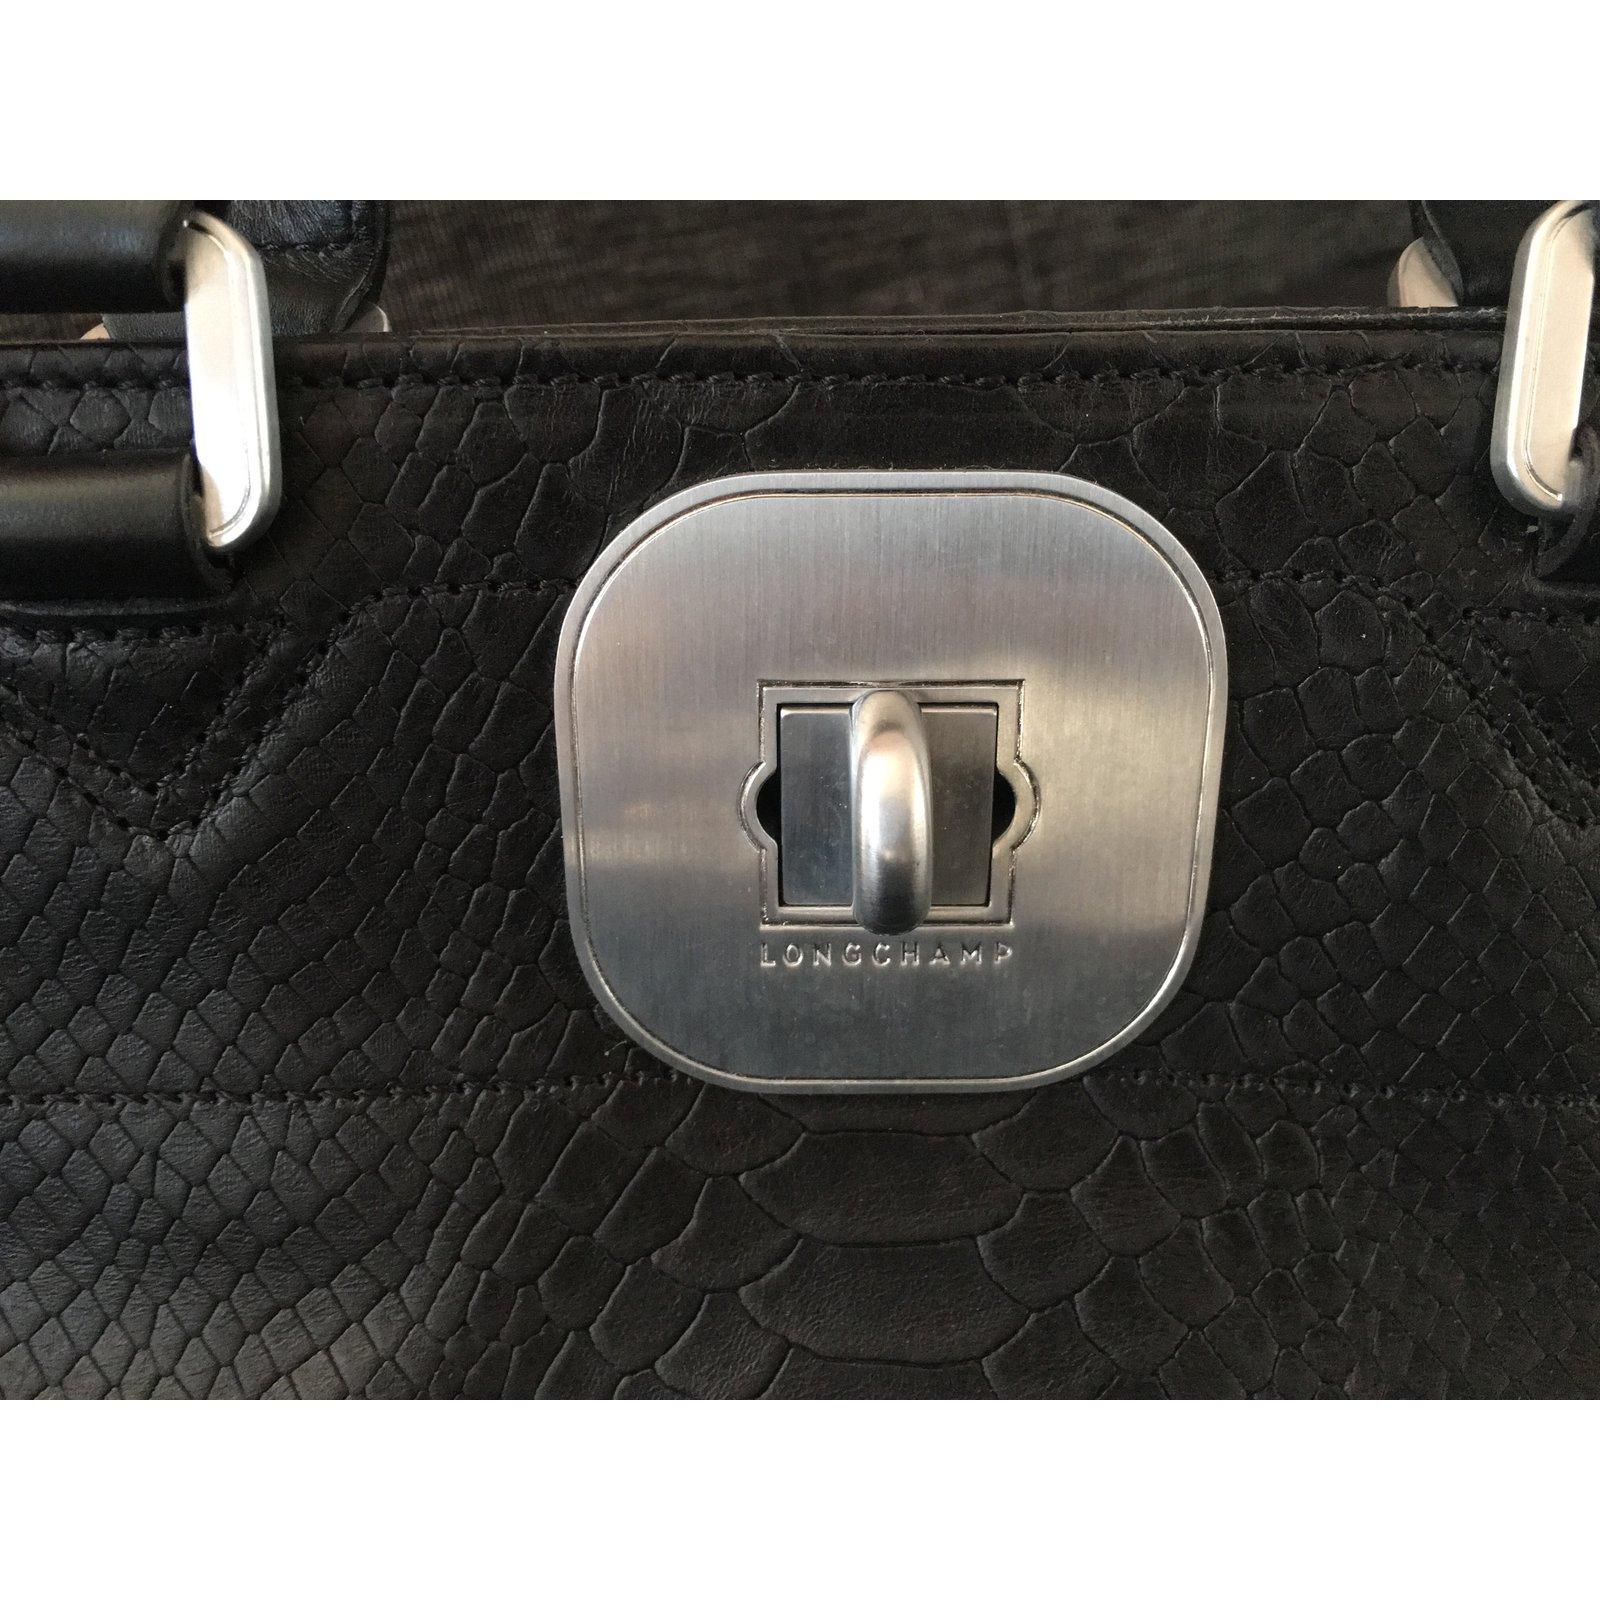 Sac Longchamp Gatsby Noir Gatsby Gatsby Sac Sac Noir Longchamp Longchamp vpvTxwRq